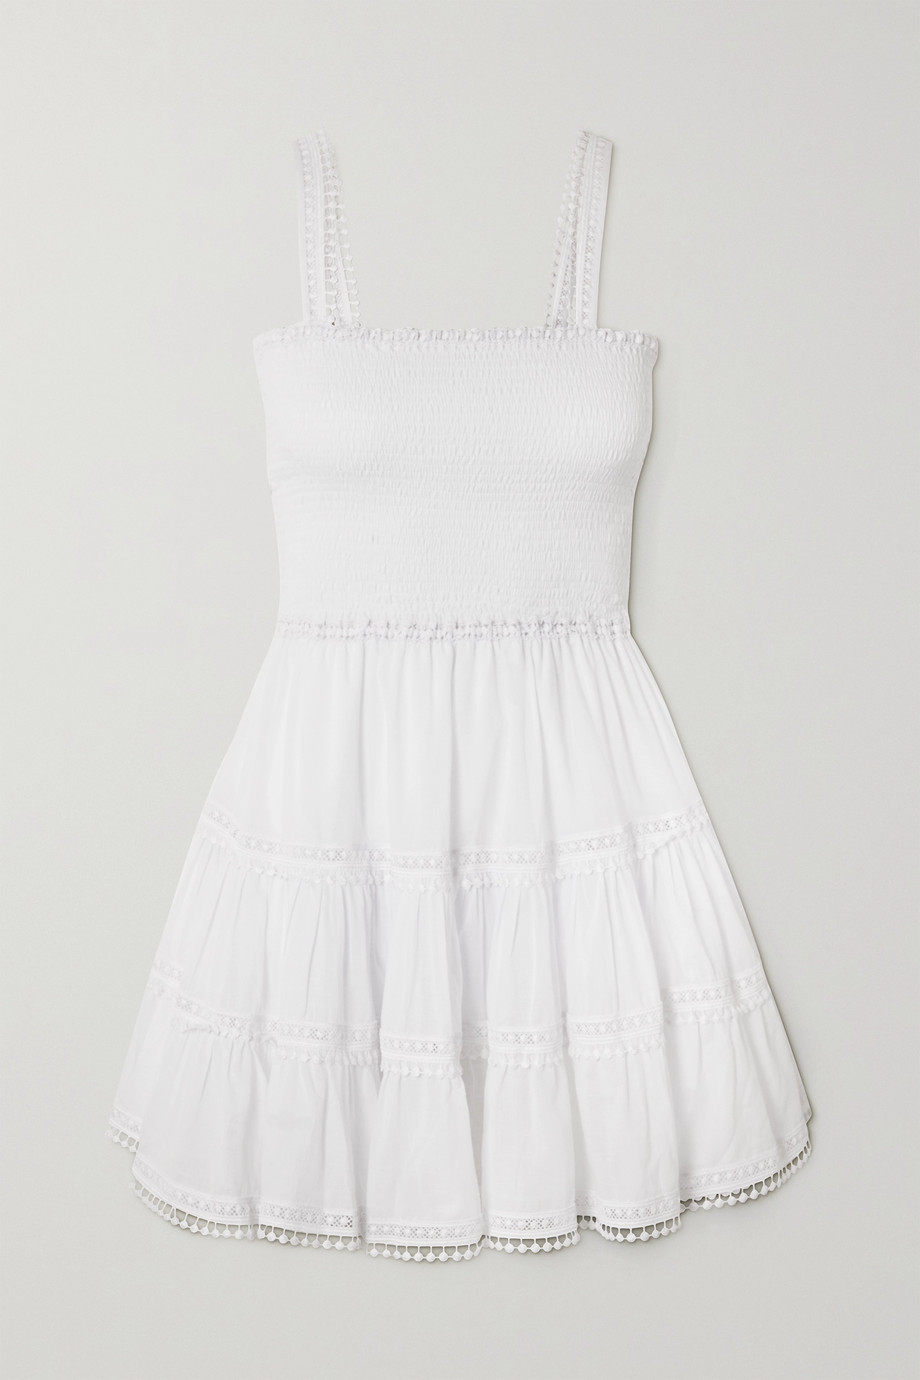 Charo Ruiz Stelle shirred crochet-trimmed cotton-blend voile mini dress